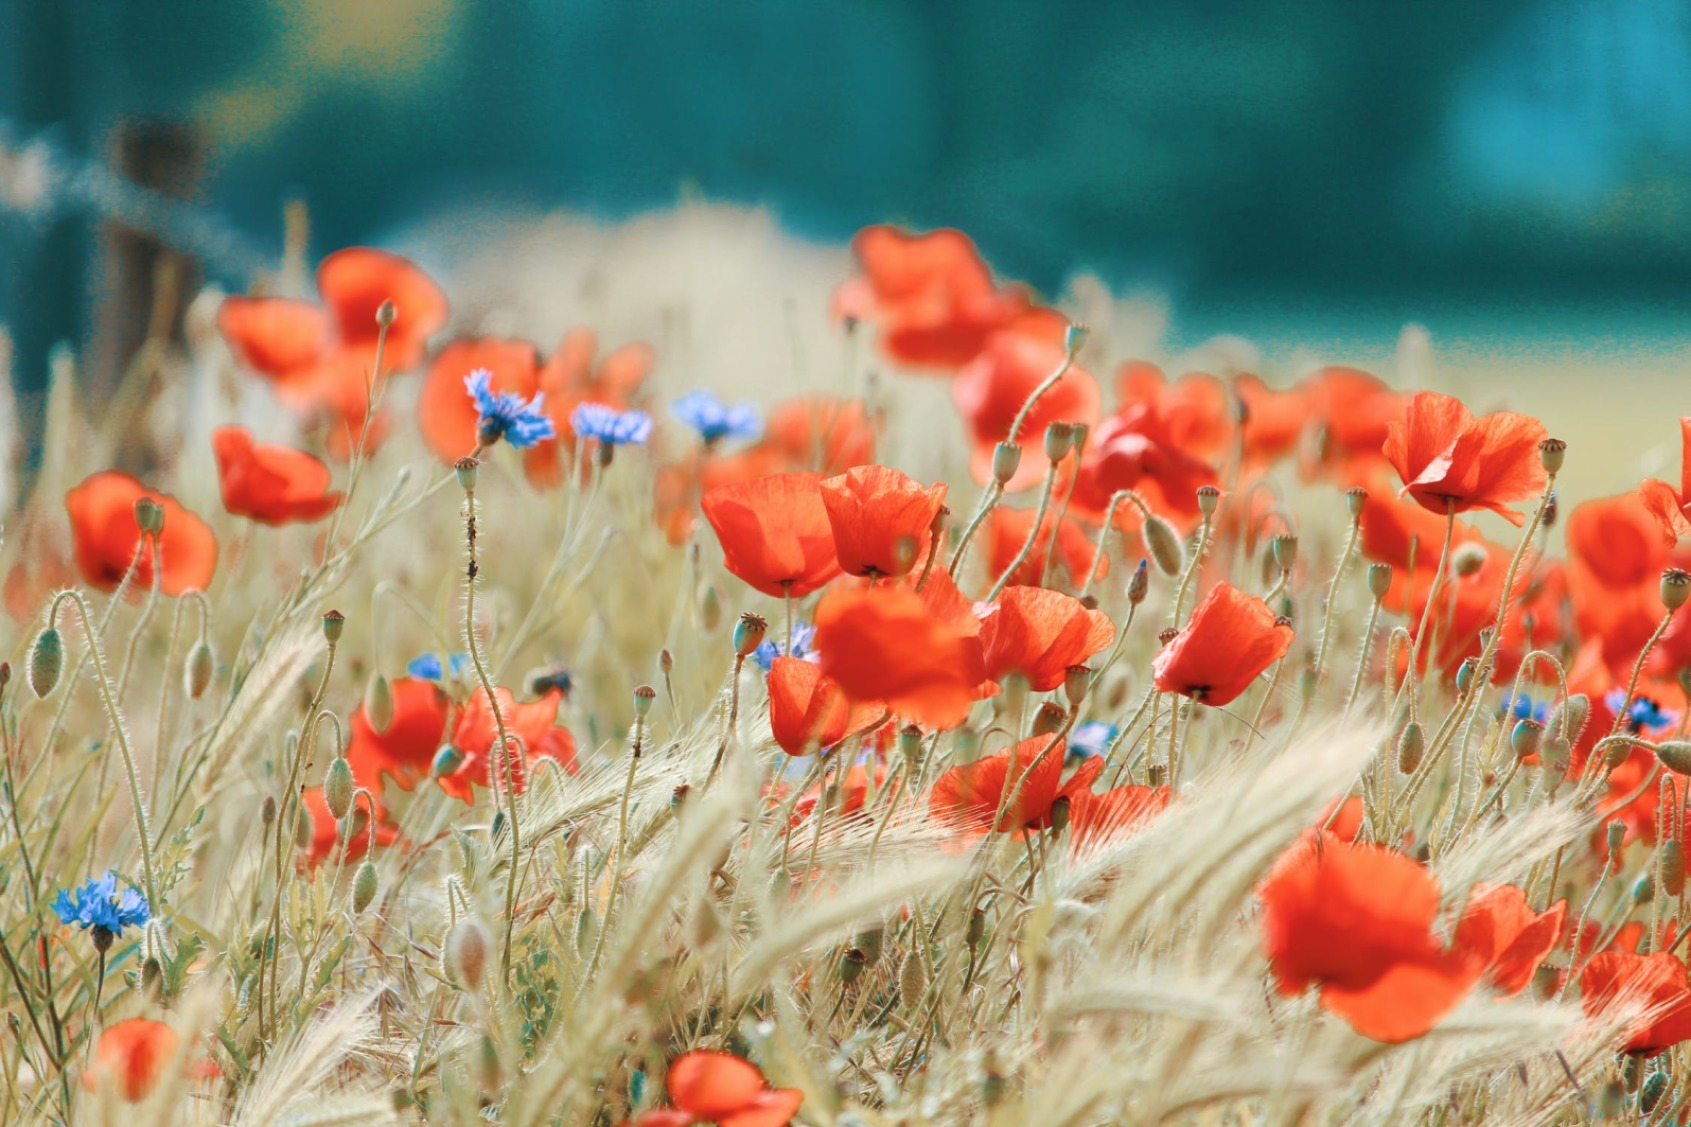 Poppy Flowers On The Wheat Field - Original image